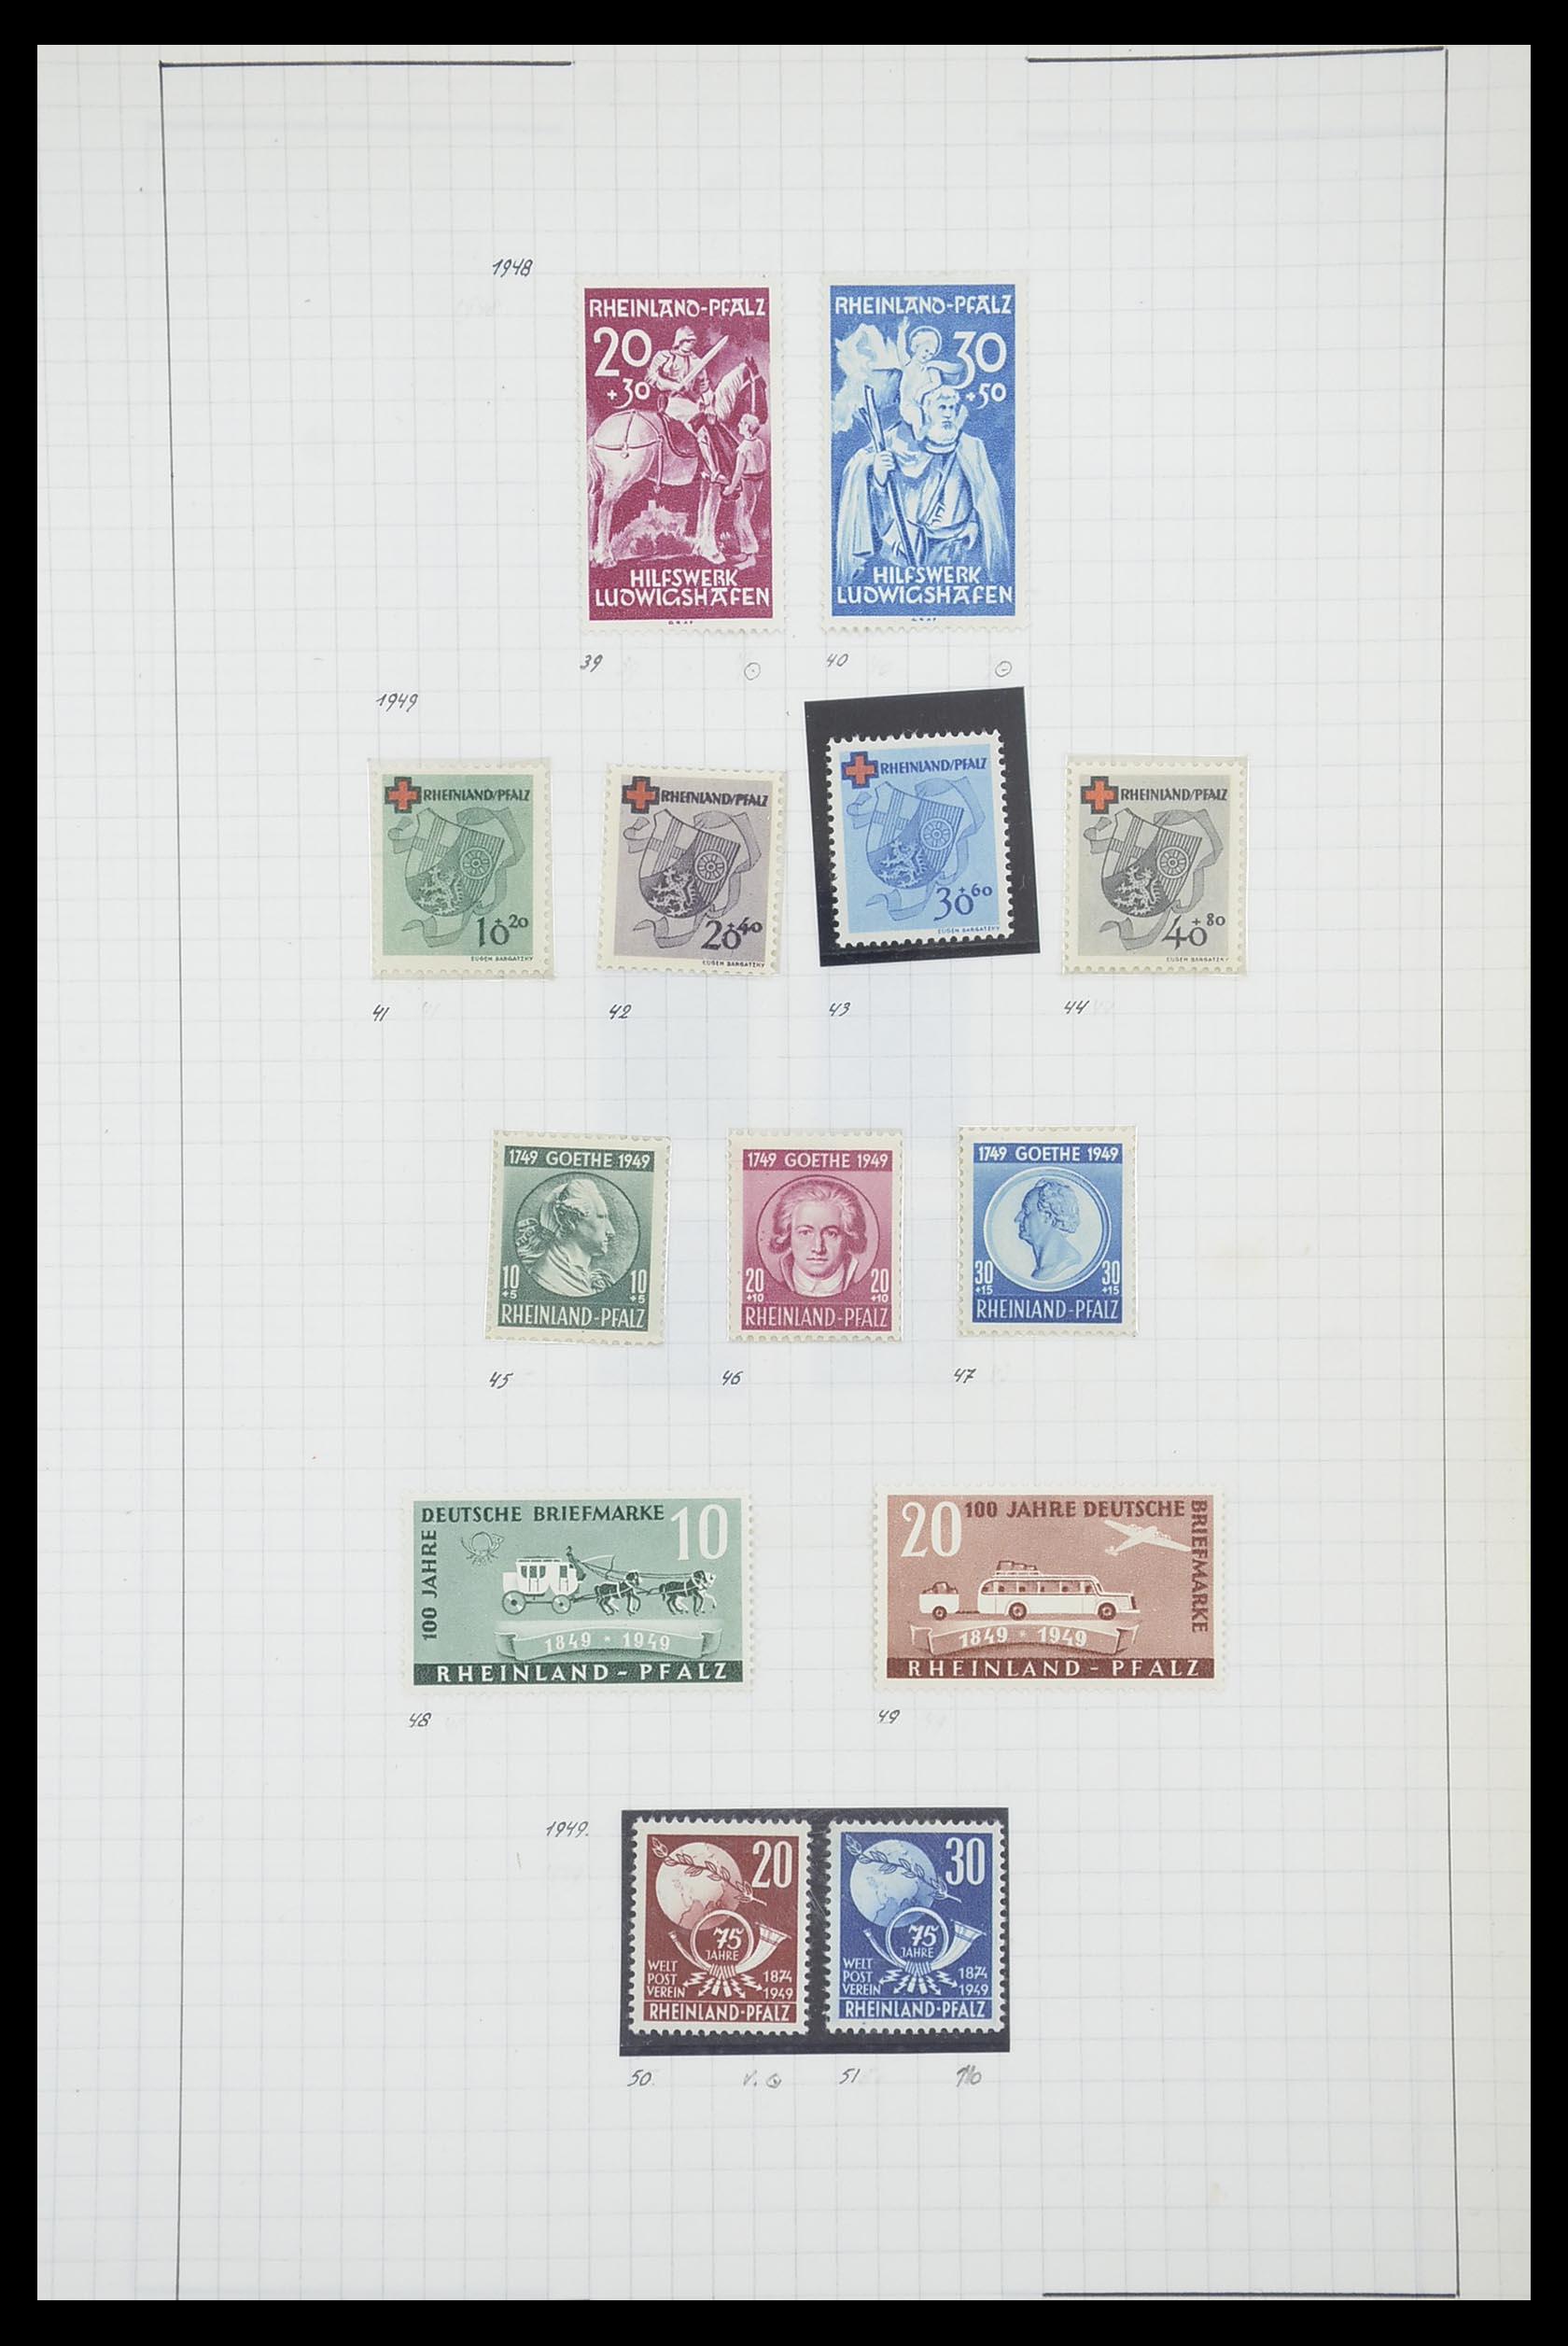 33864 017 - Postzegelverzameling 33864 Franse Zone 1945-1949.